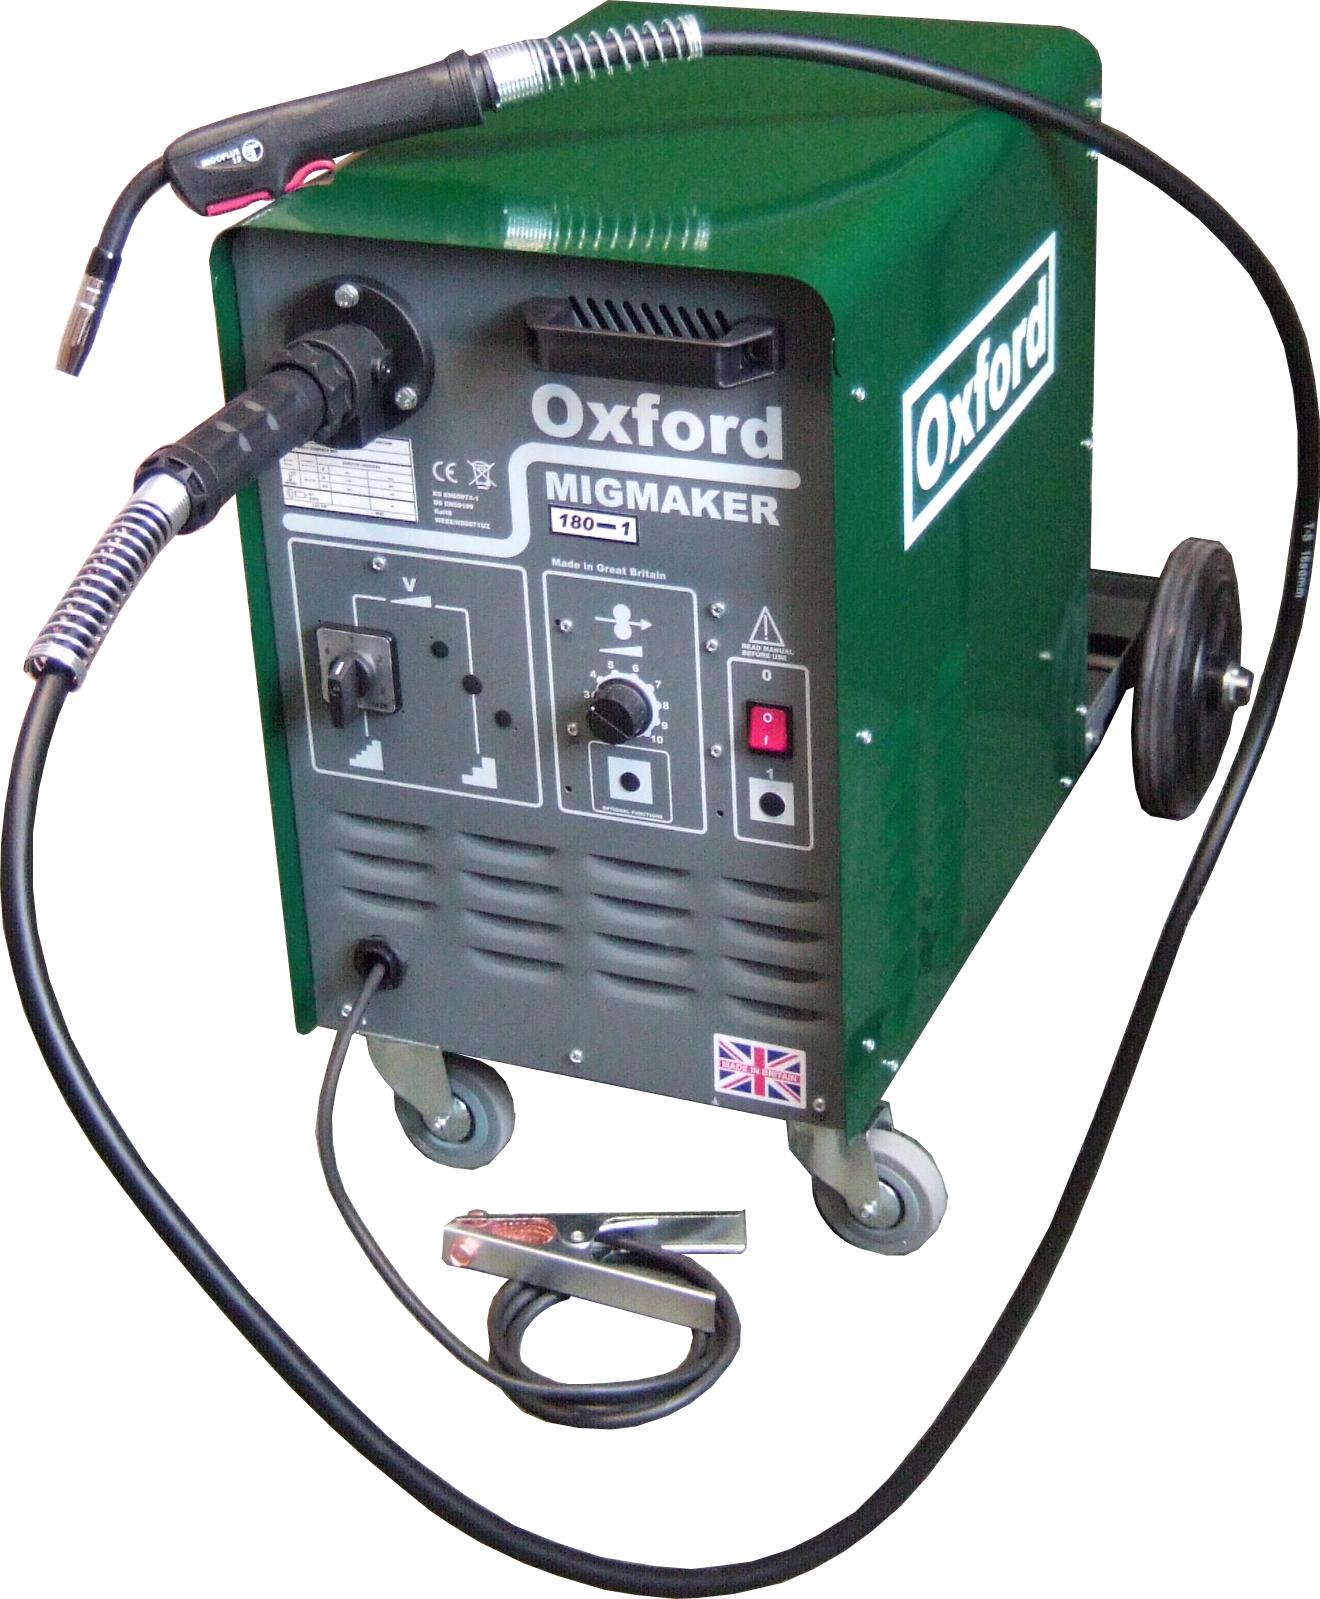 singlephasemig_16_3456303860 oxford arc welder wiring diagram best wiring diagram 2017 oxford welder wiring diagram at arjmand.co